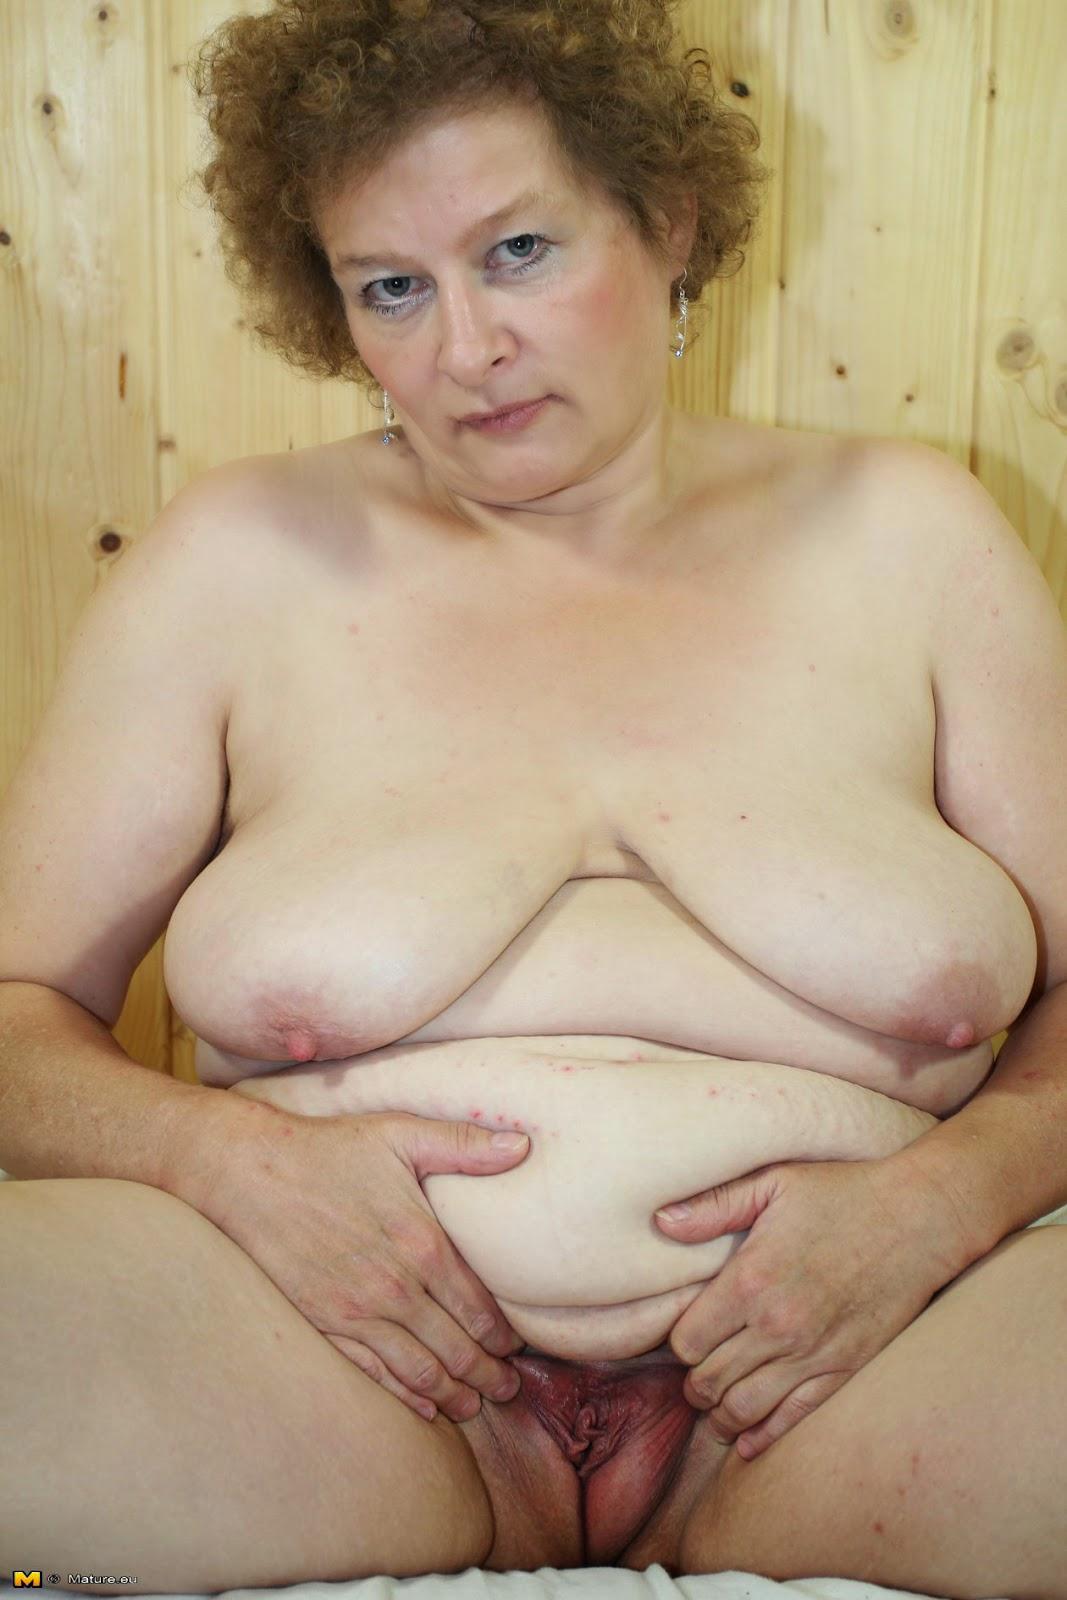 Free mature woman sex thumb